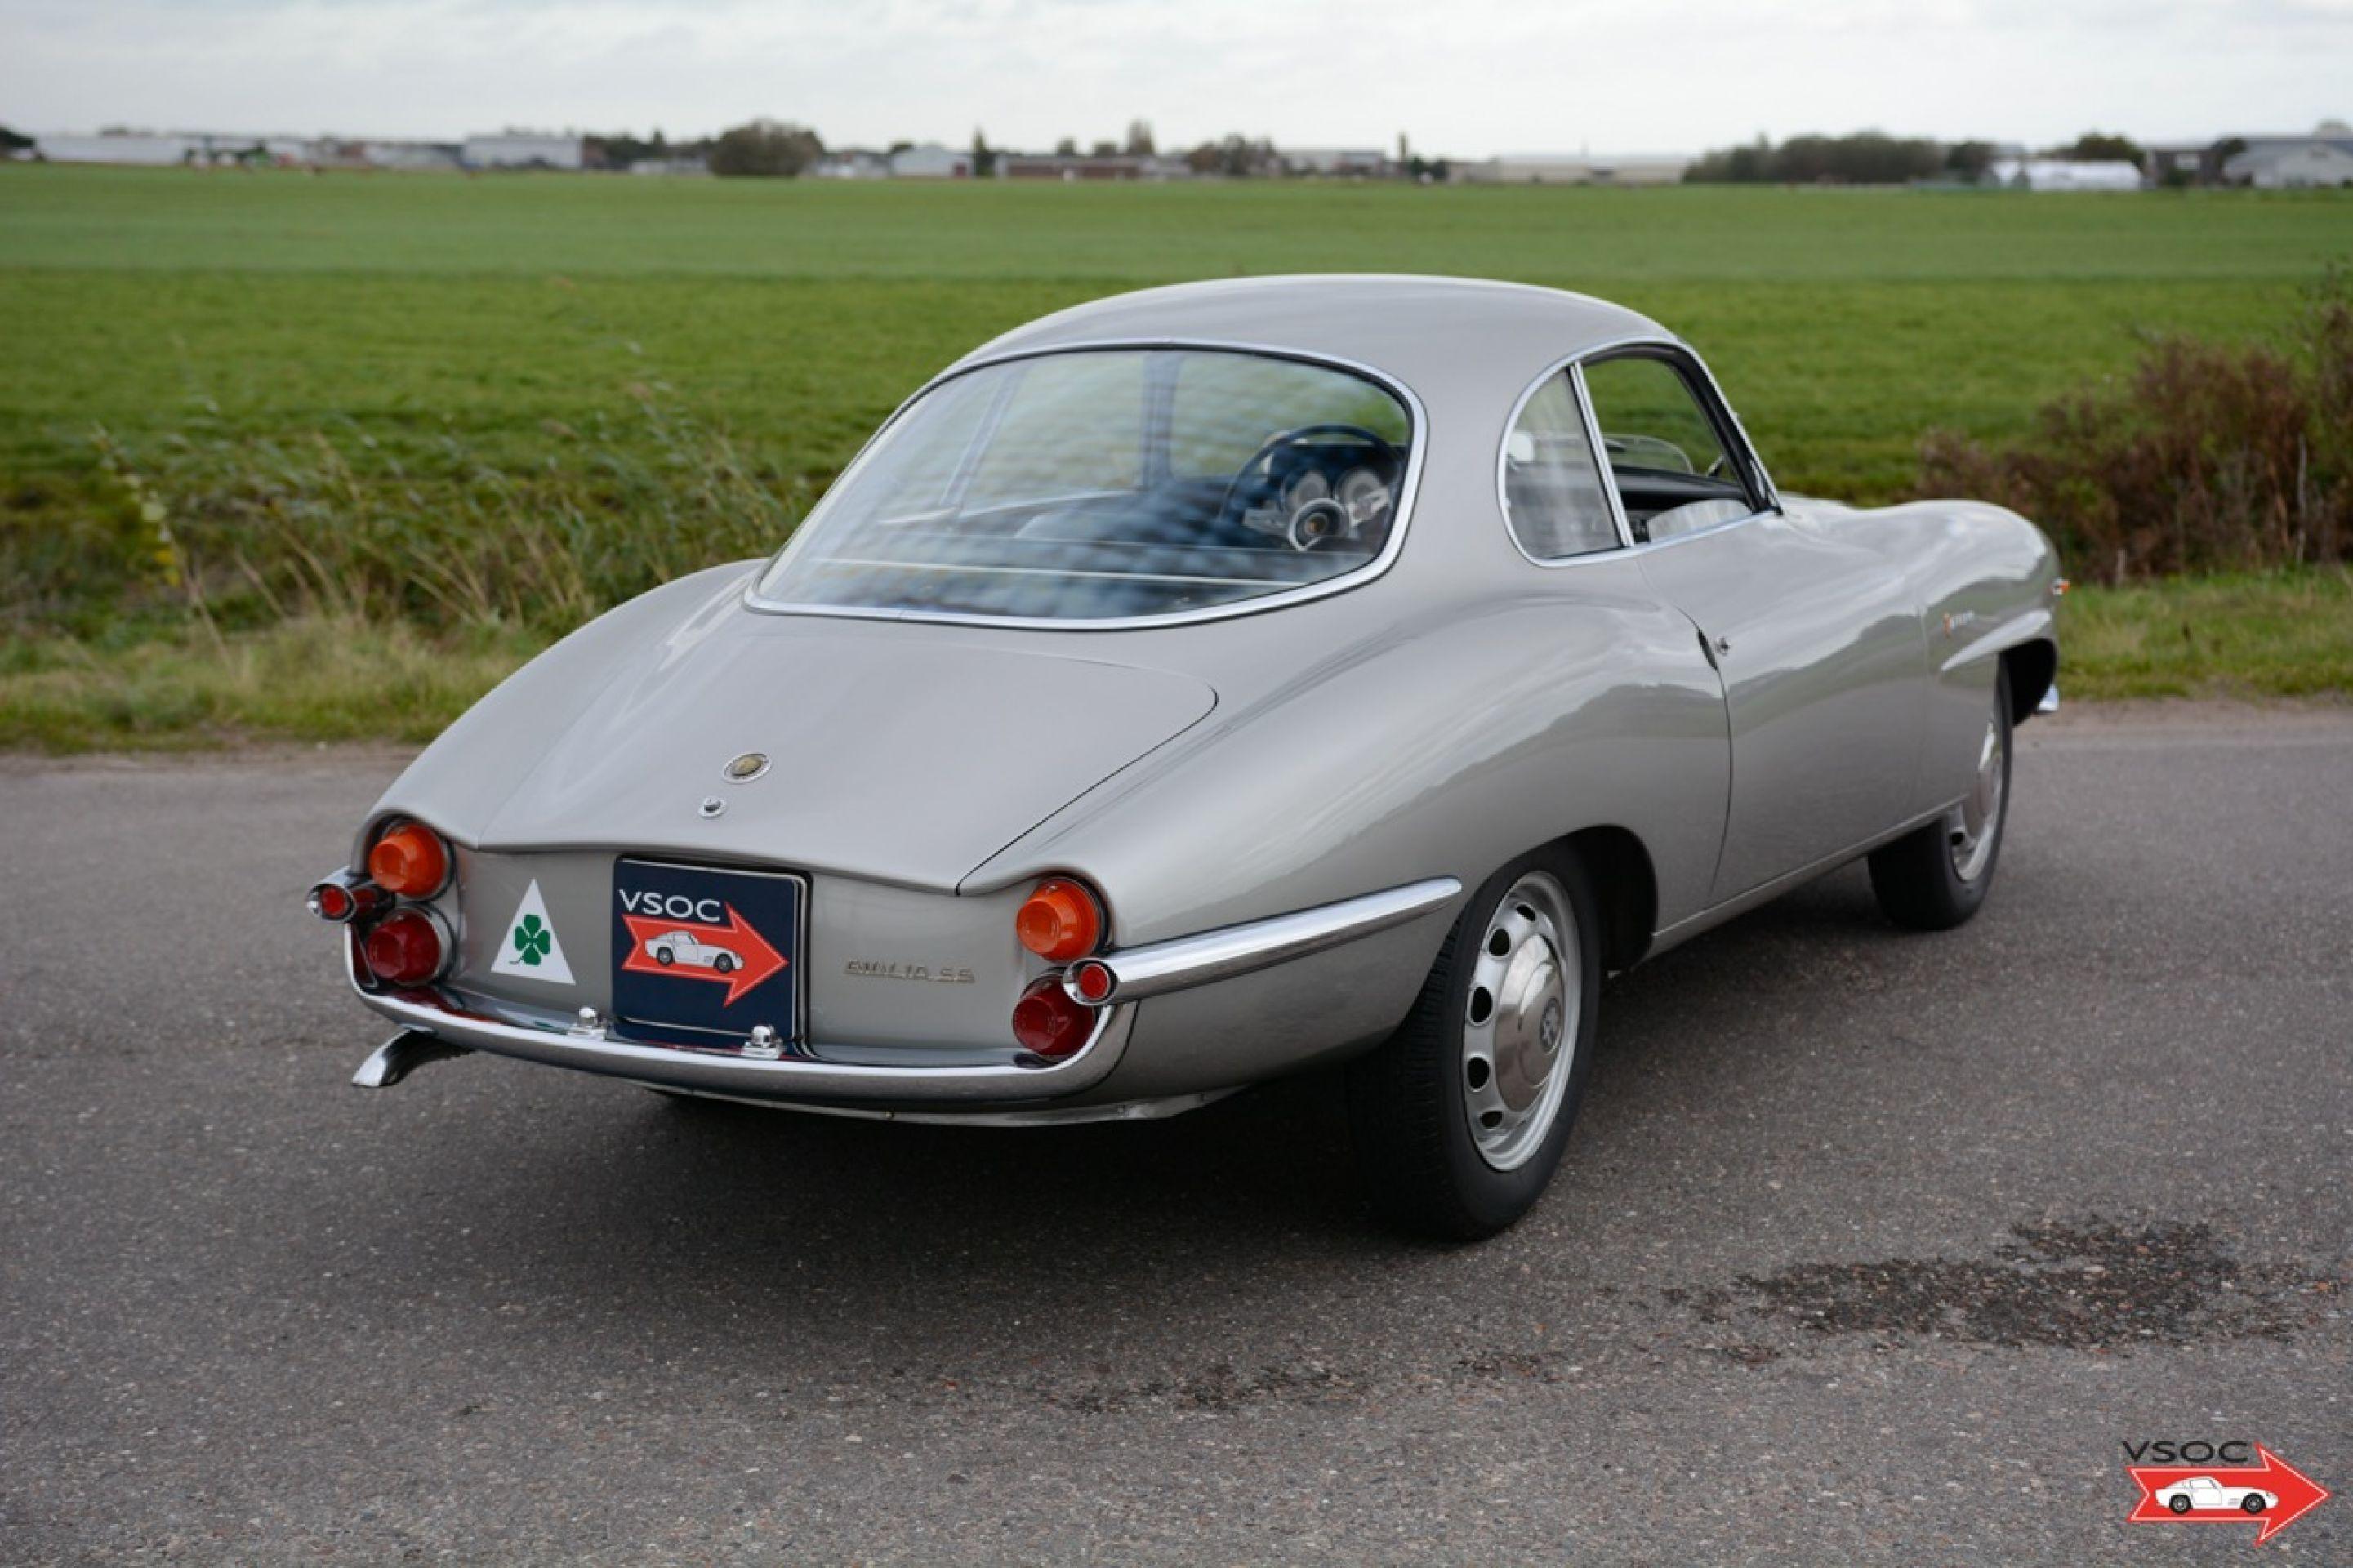 1965 Alfa Romeo Giulia 1600 'SS' Sprint Speciale - wonderful example